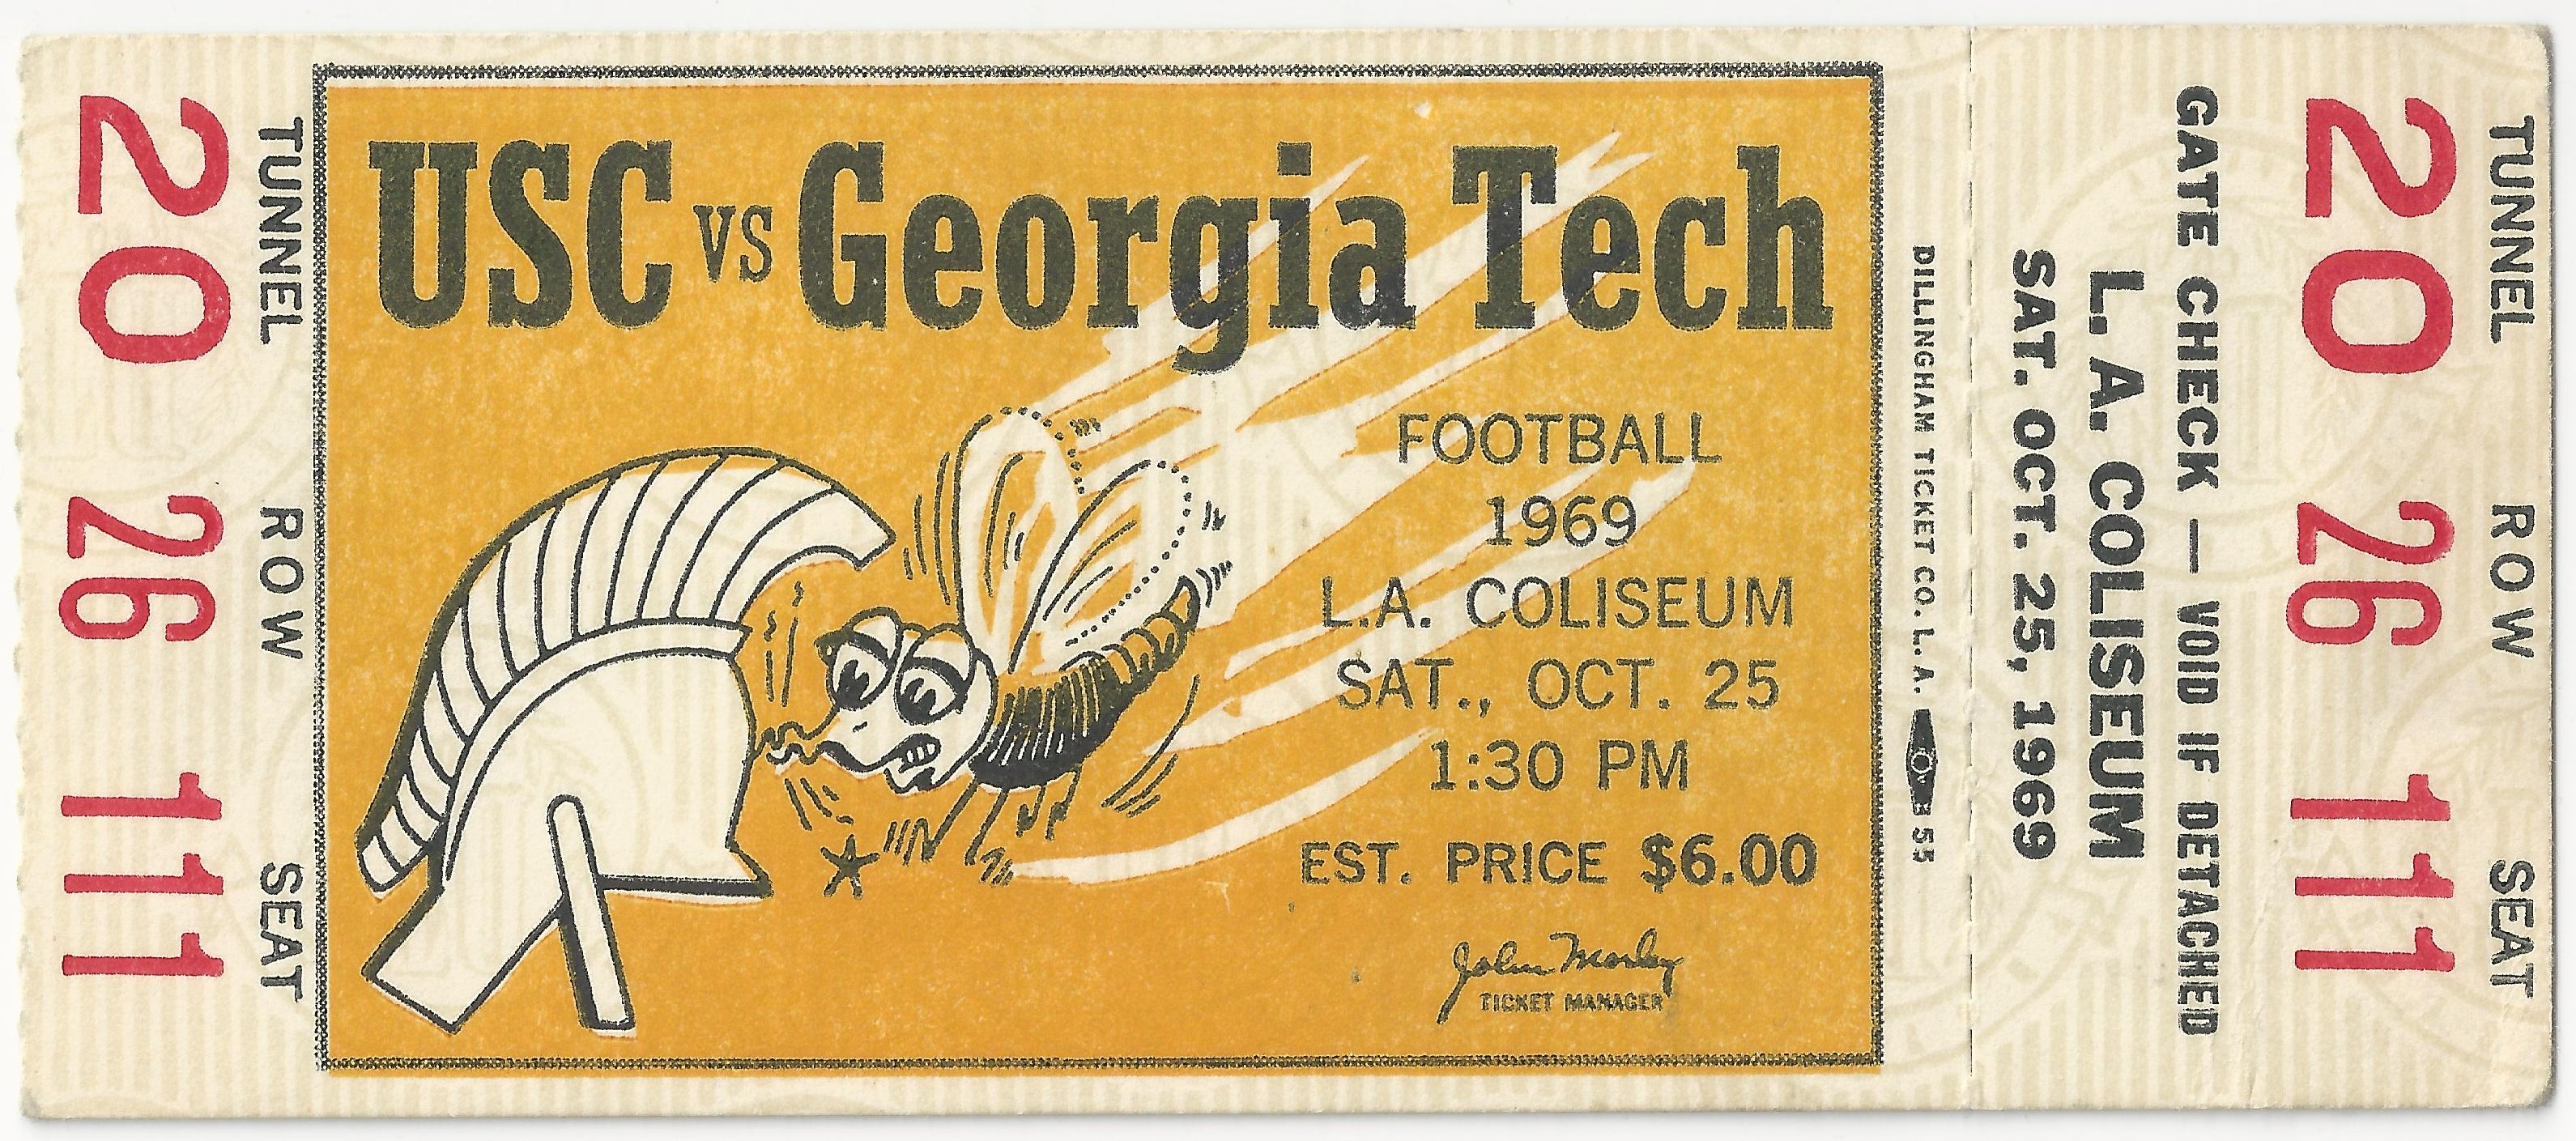 1969-10-25 - Georgia Tech at Southern California - Full